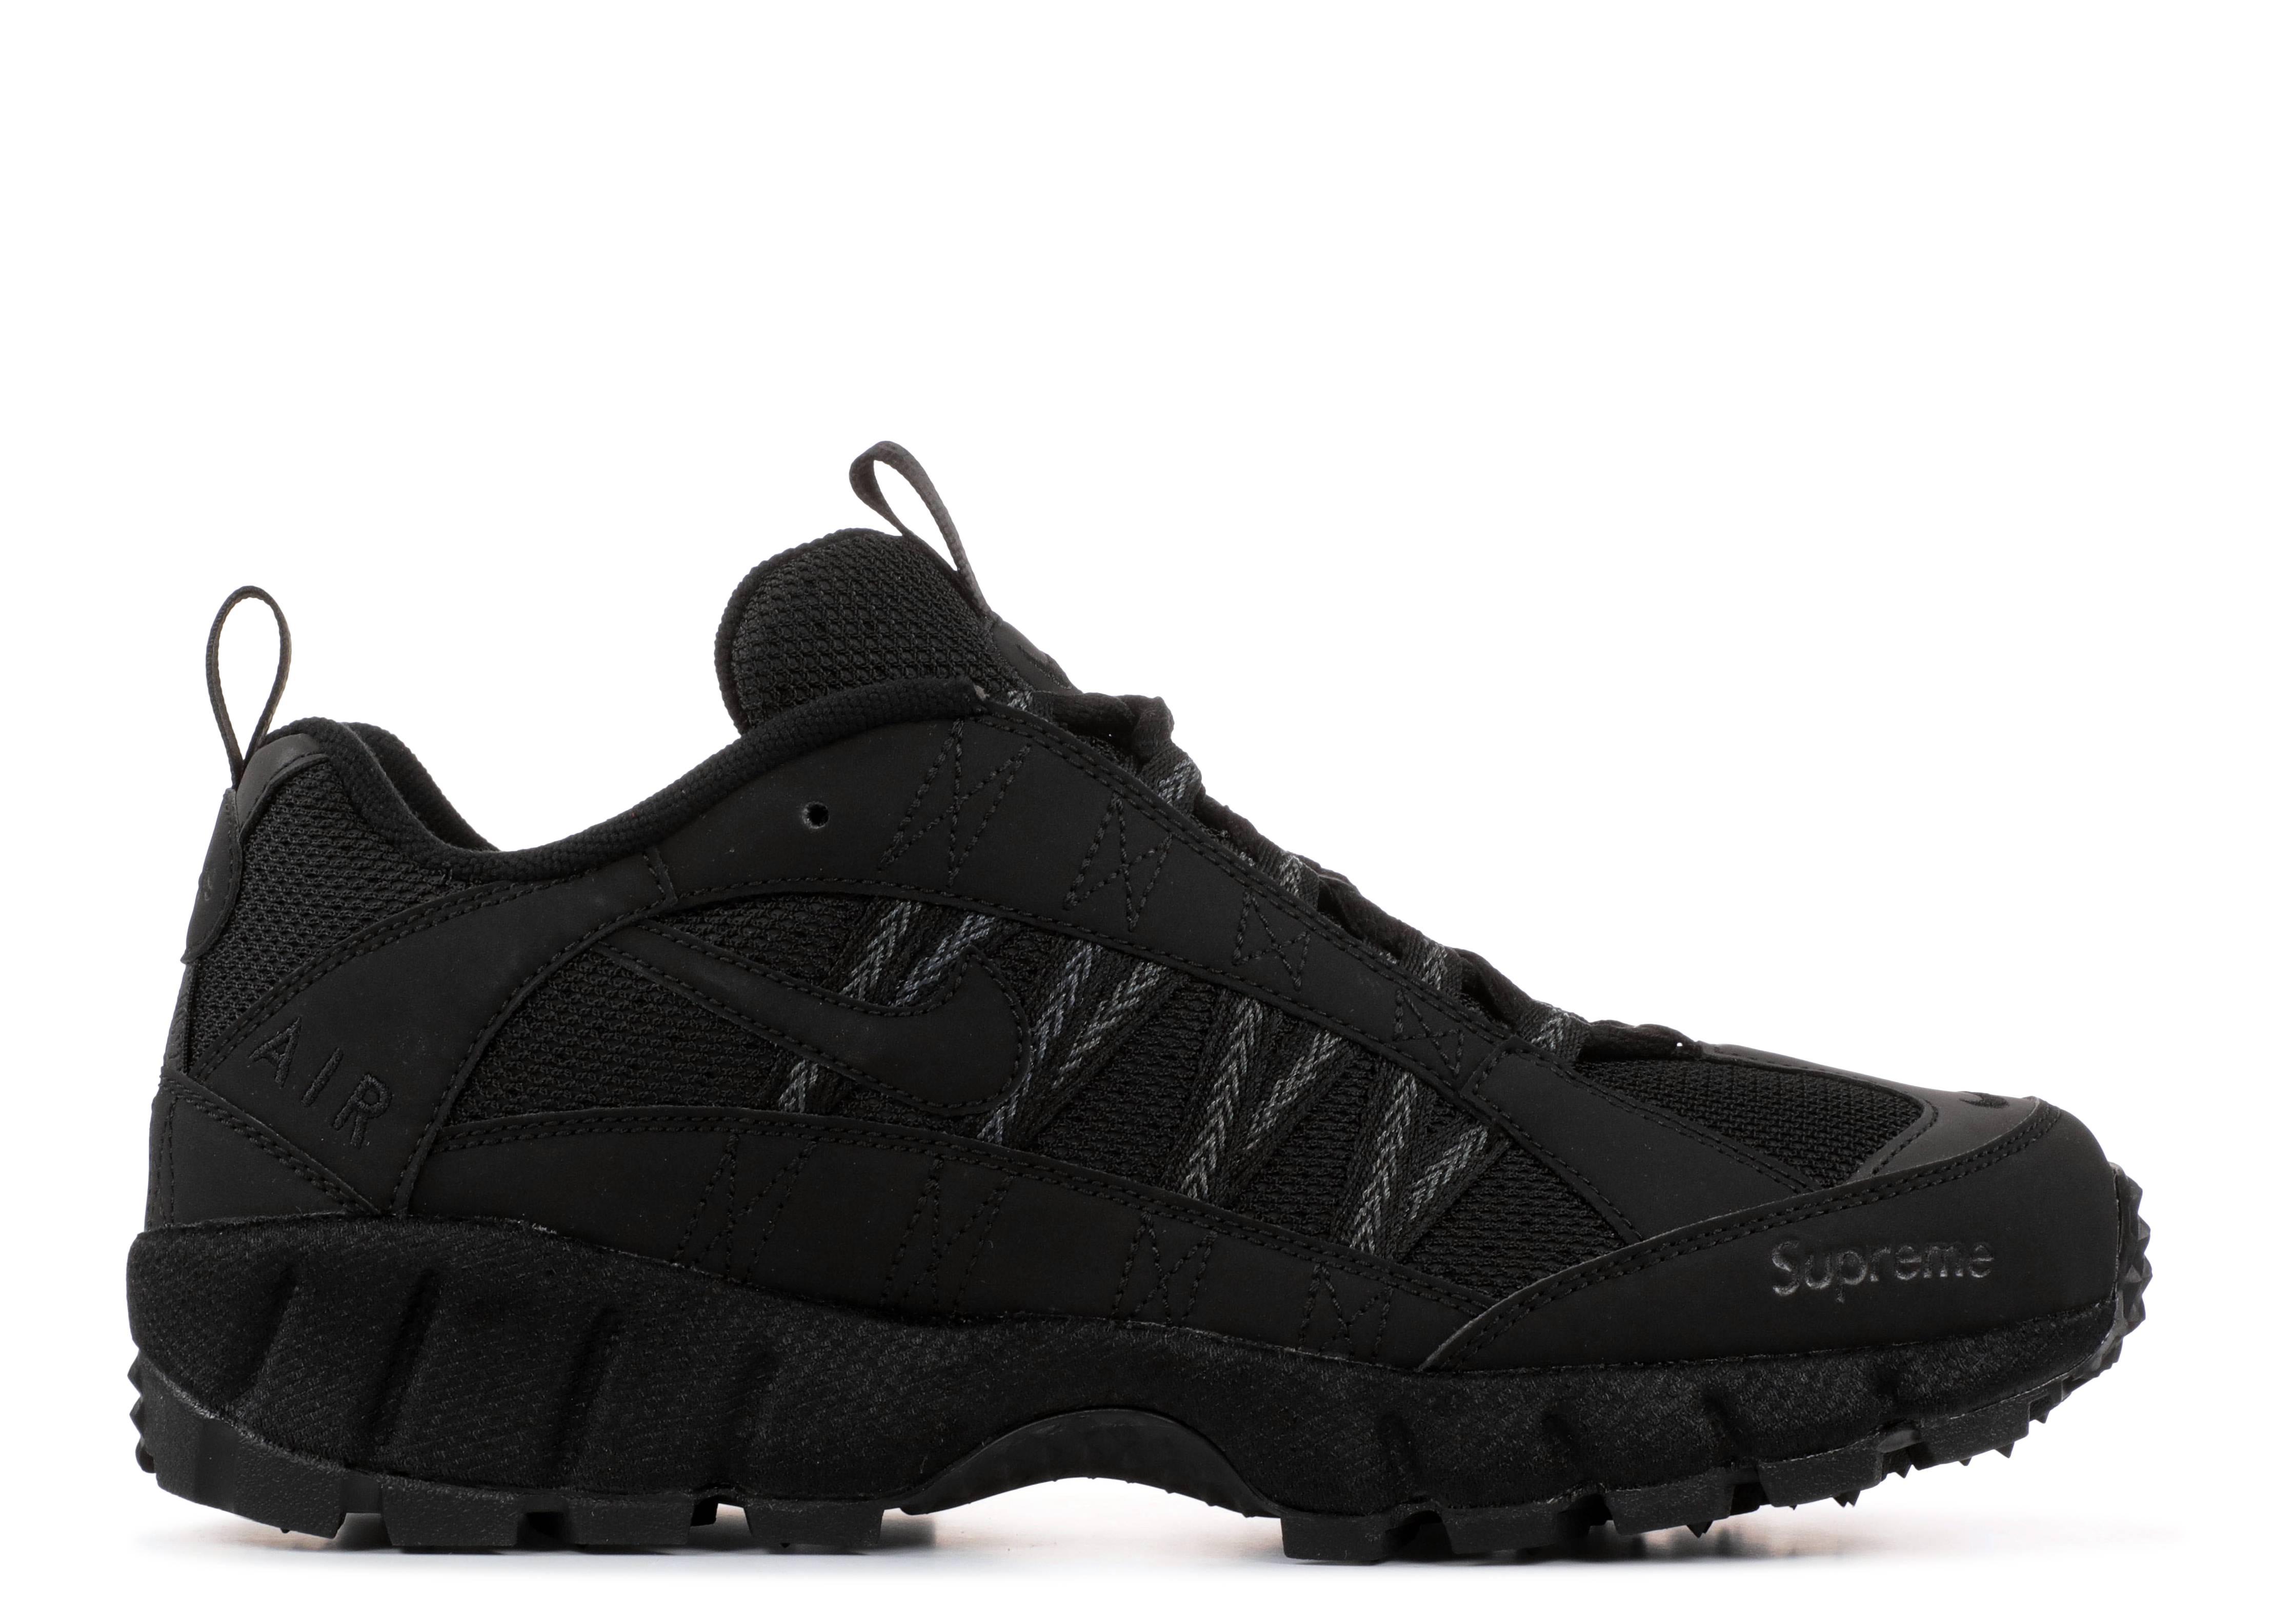 Nike Air Humara '17 924464-001 Black/Black Us Size 10.5 Brand New - B6914